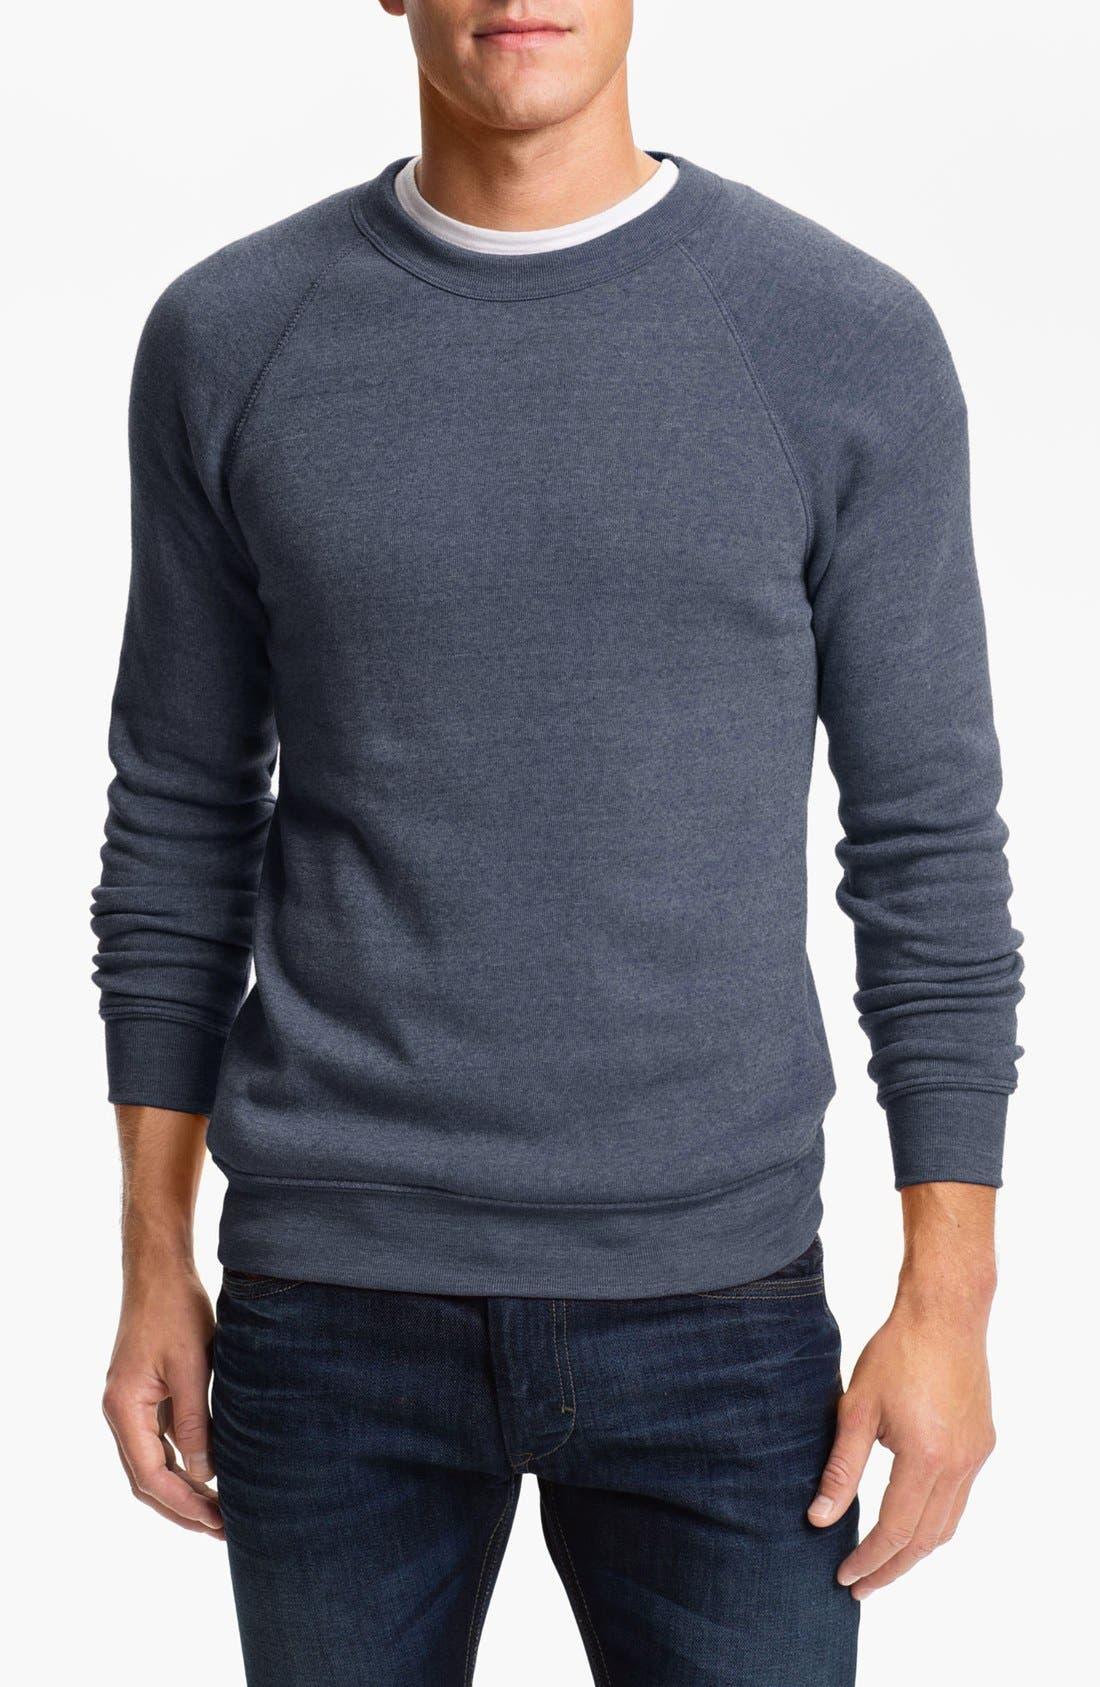 'The Champ' Sweatshirt,                             Main thumbnail 10, color,